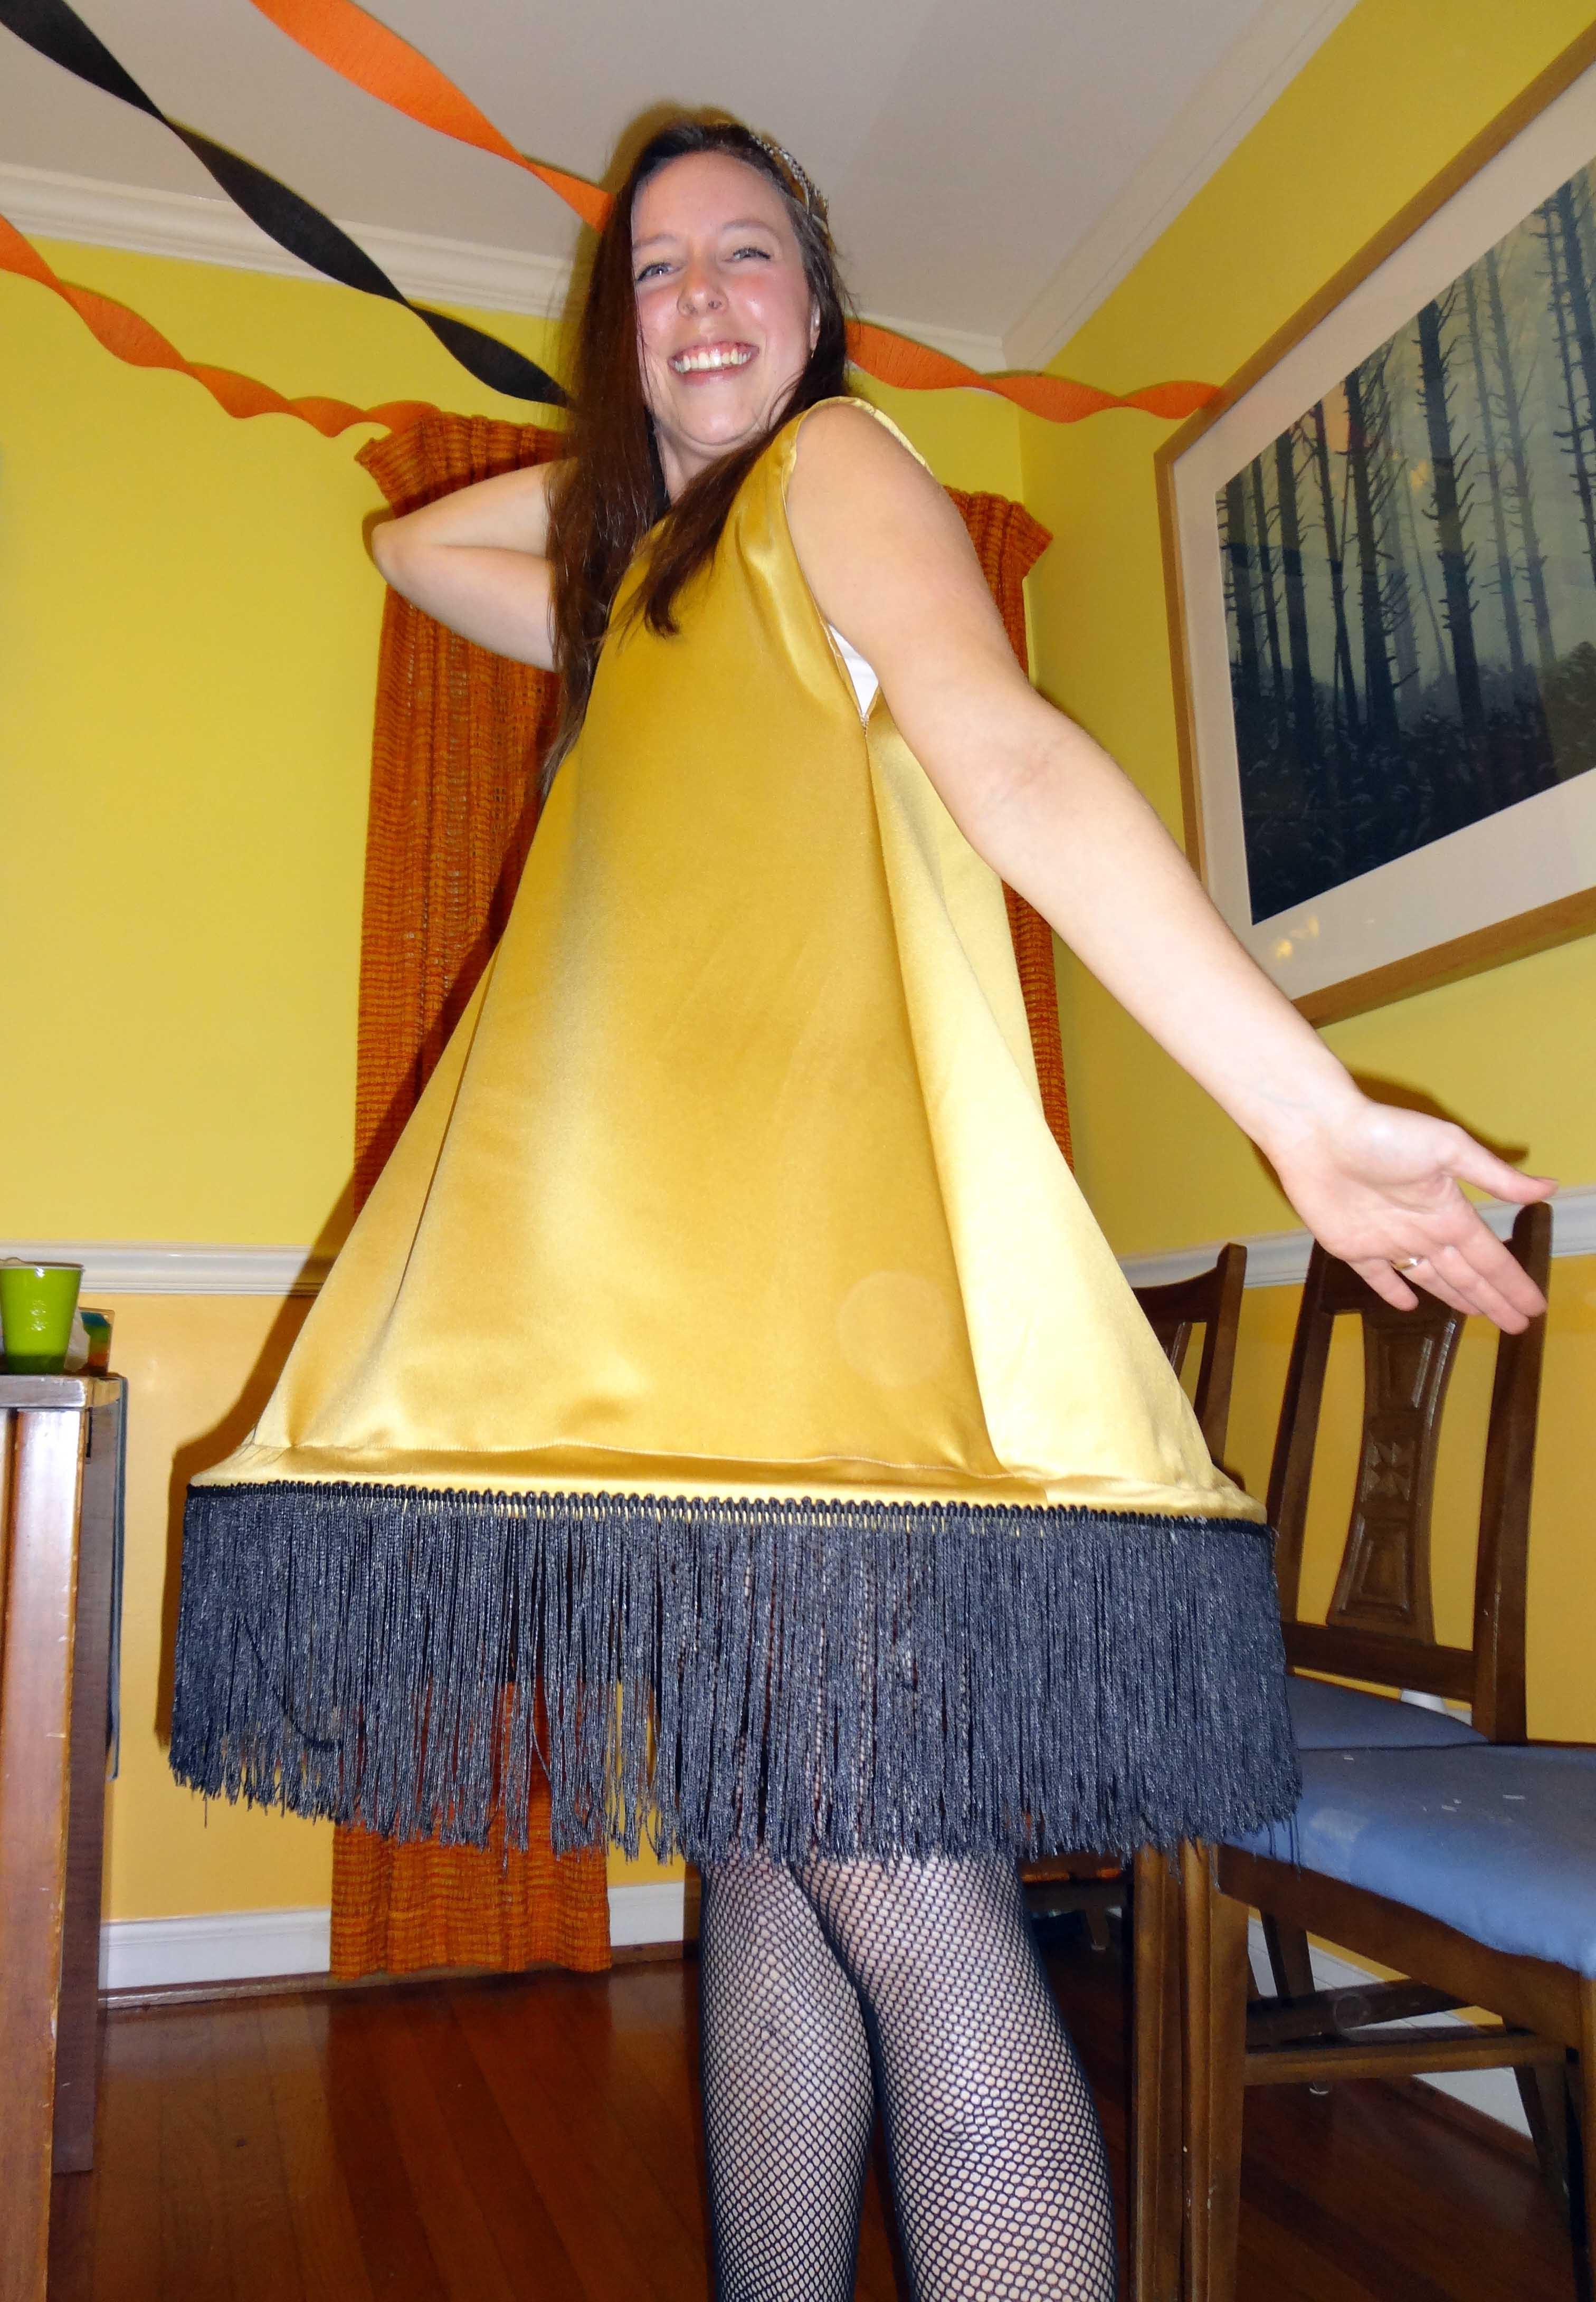 Leg Lamp Halloween Costume  Halloween Costume Party